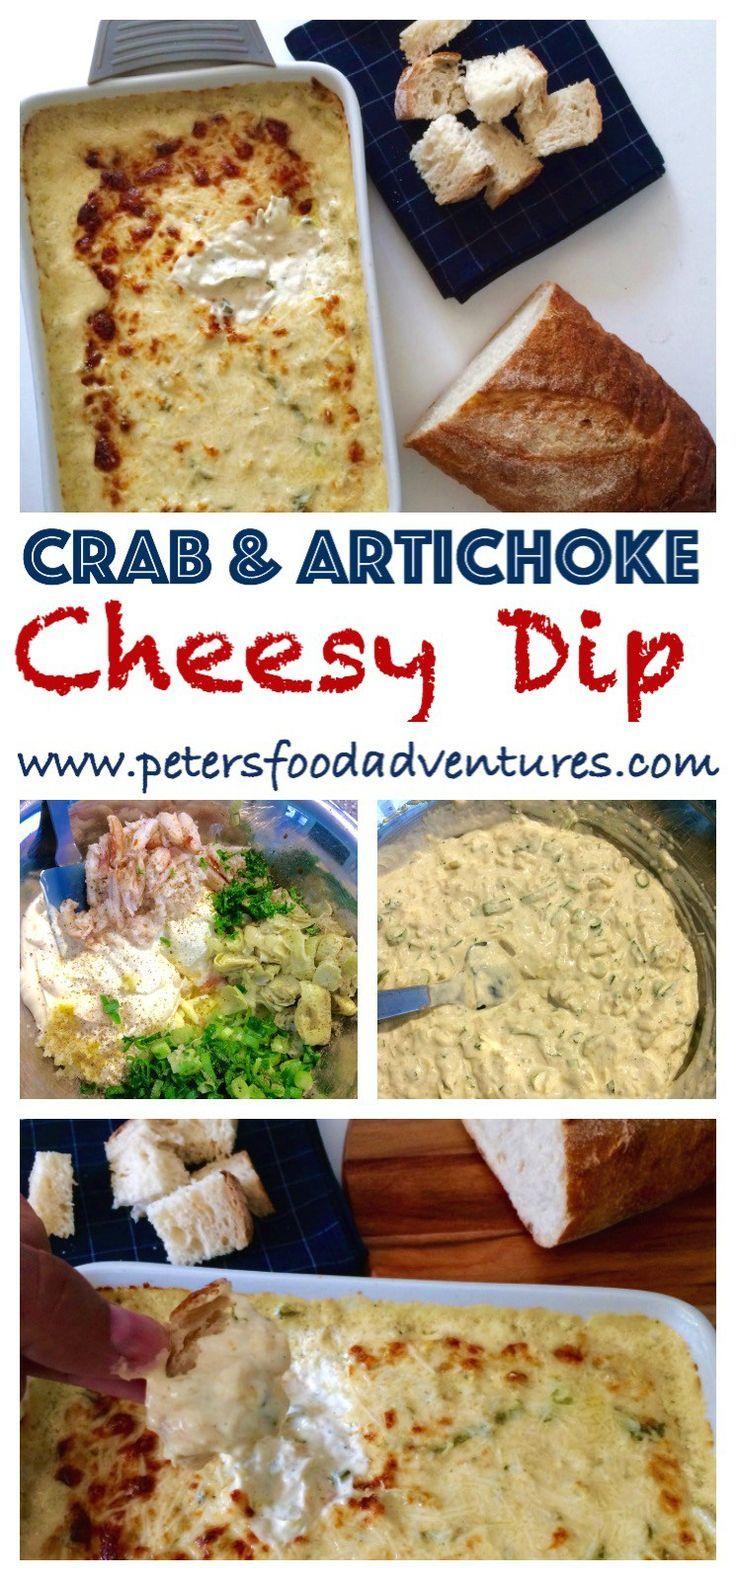 Cheesy Crab and Artichoke Dip | Recipe | Crab and artichoke dip ...